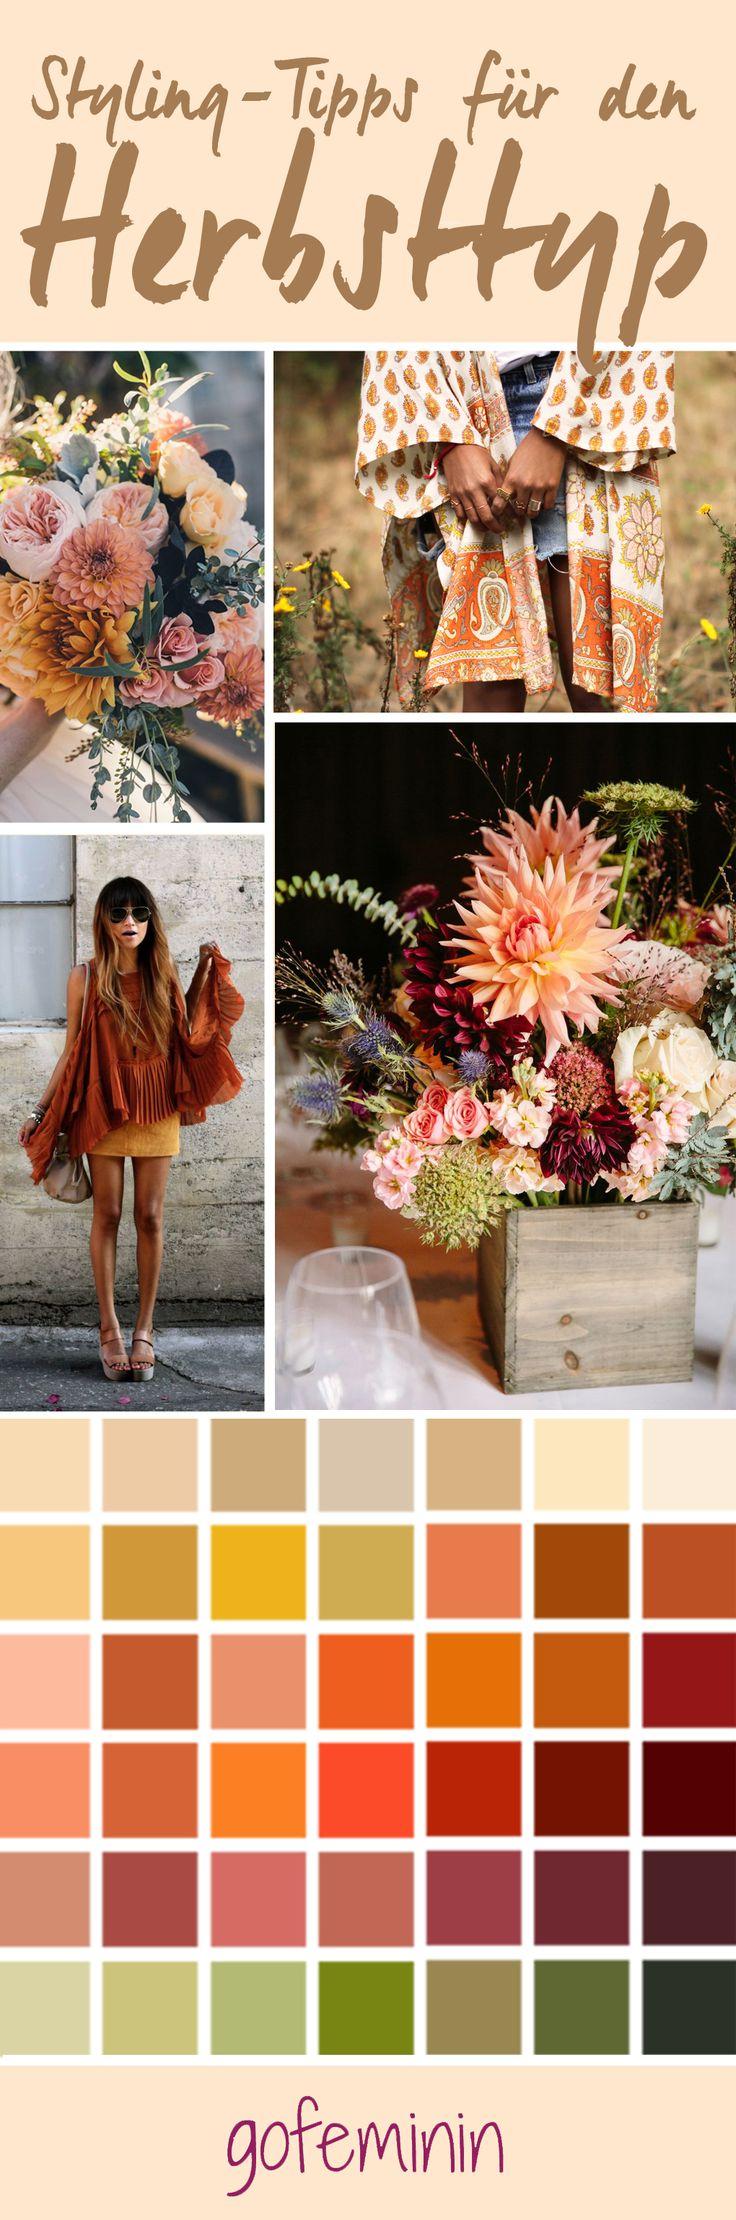 http://www.gofeminin.de/styling-tipps/herbsttyp-farben-kleidung-s1512358.html